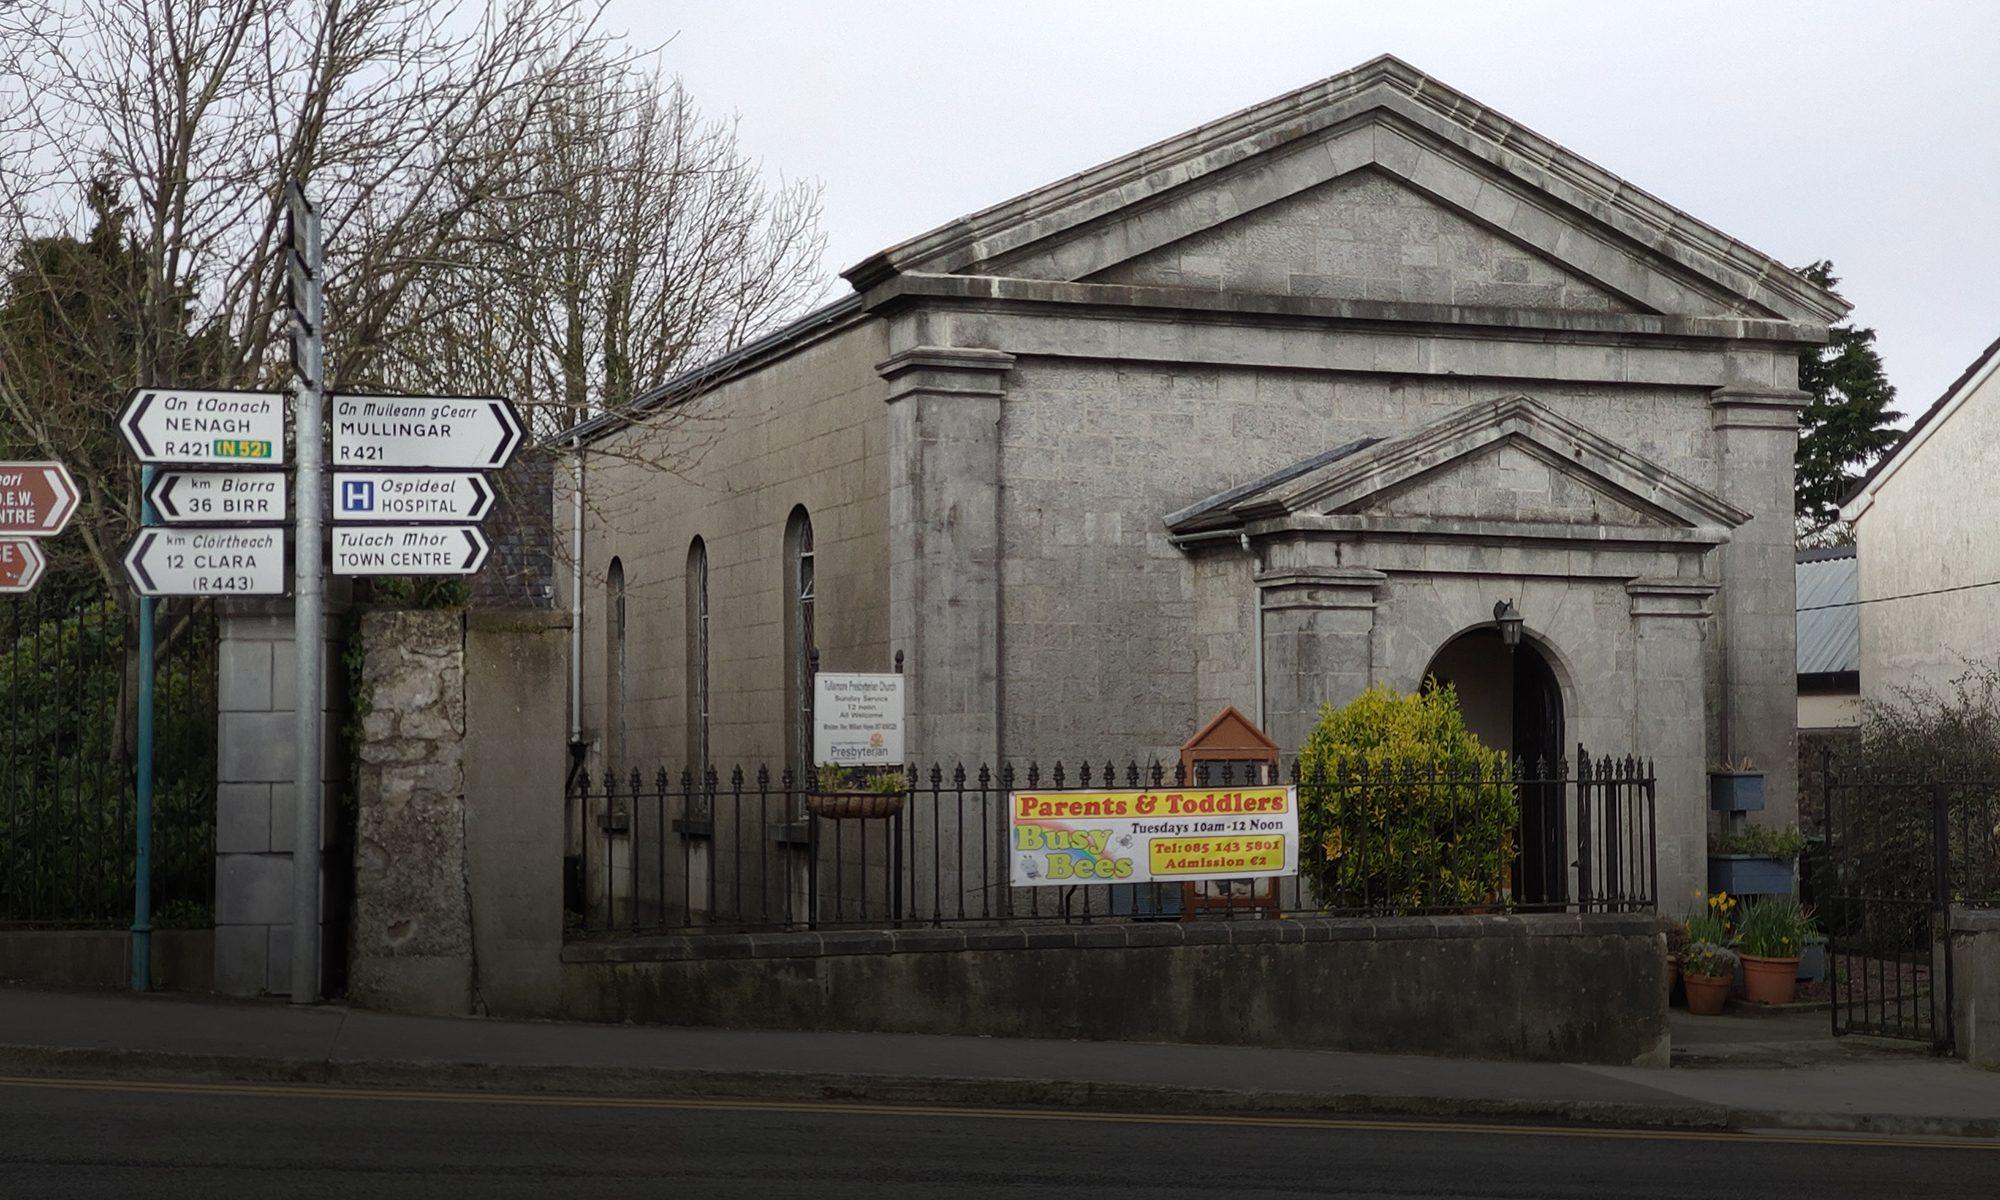 Tullamore Presbyterian Church